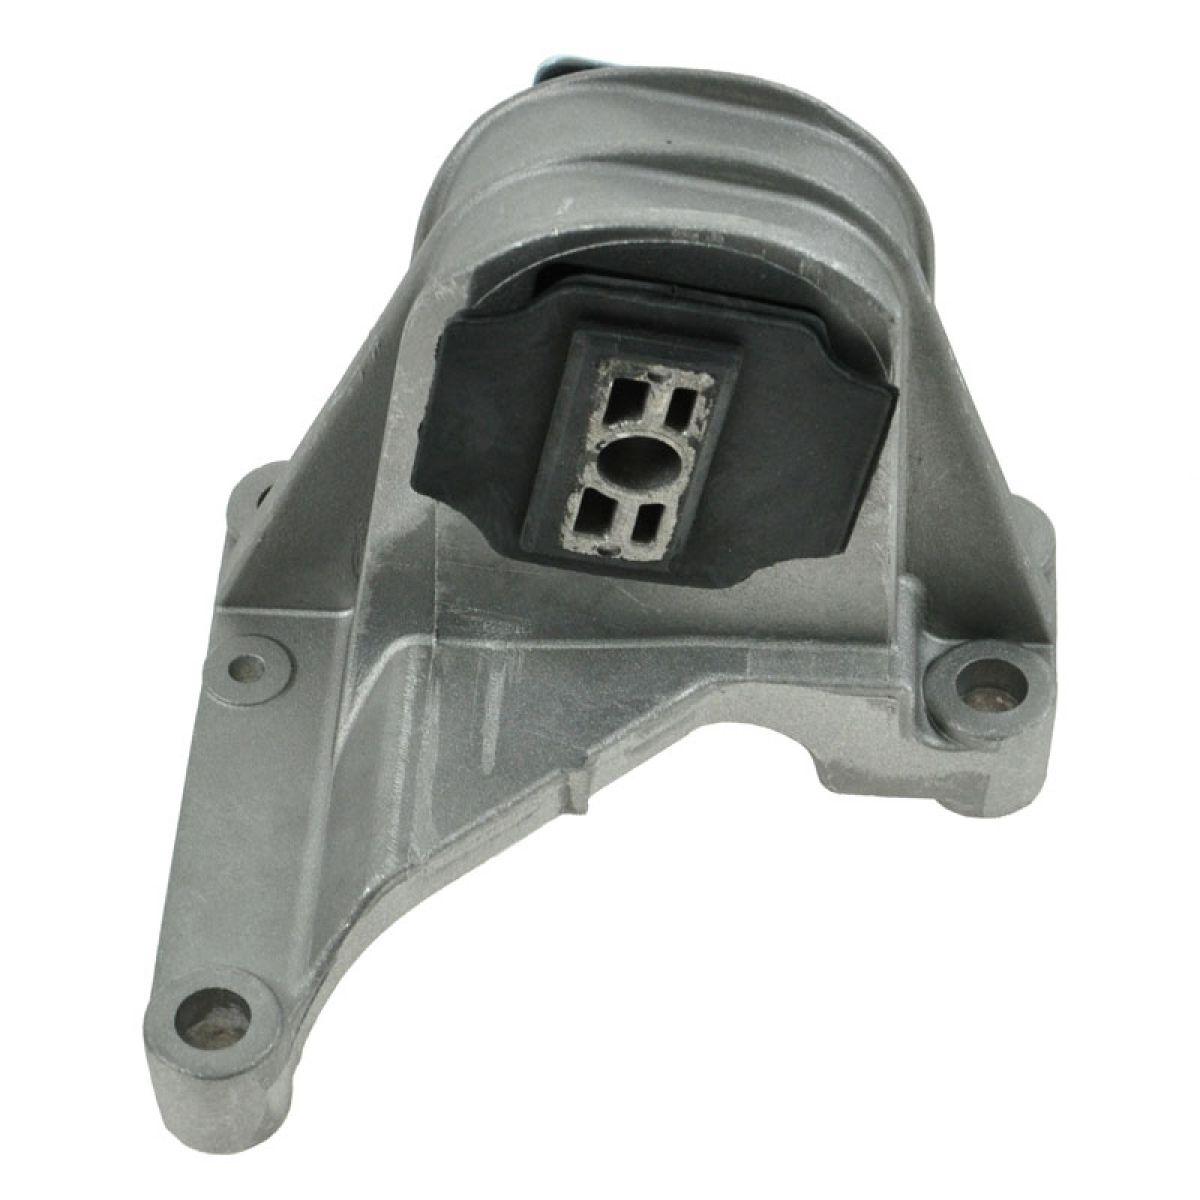 VOLVO S80 S60 V70 ENGINE UPPER SUPPORT MOUNT 30680770